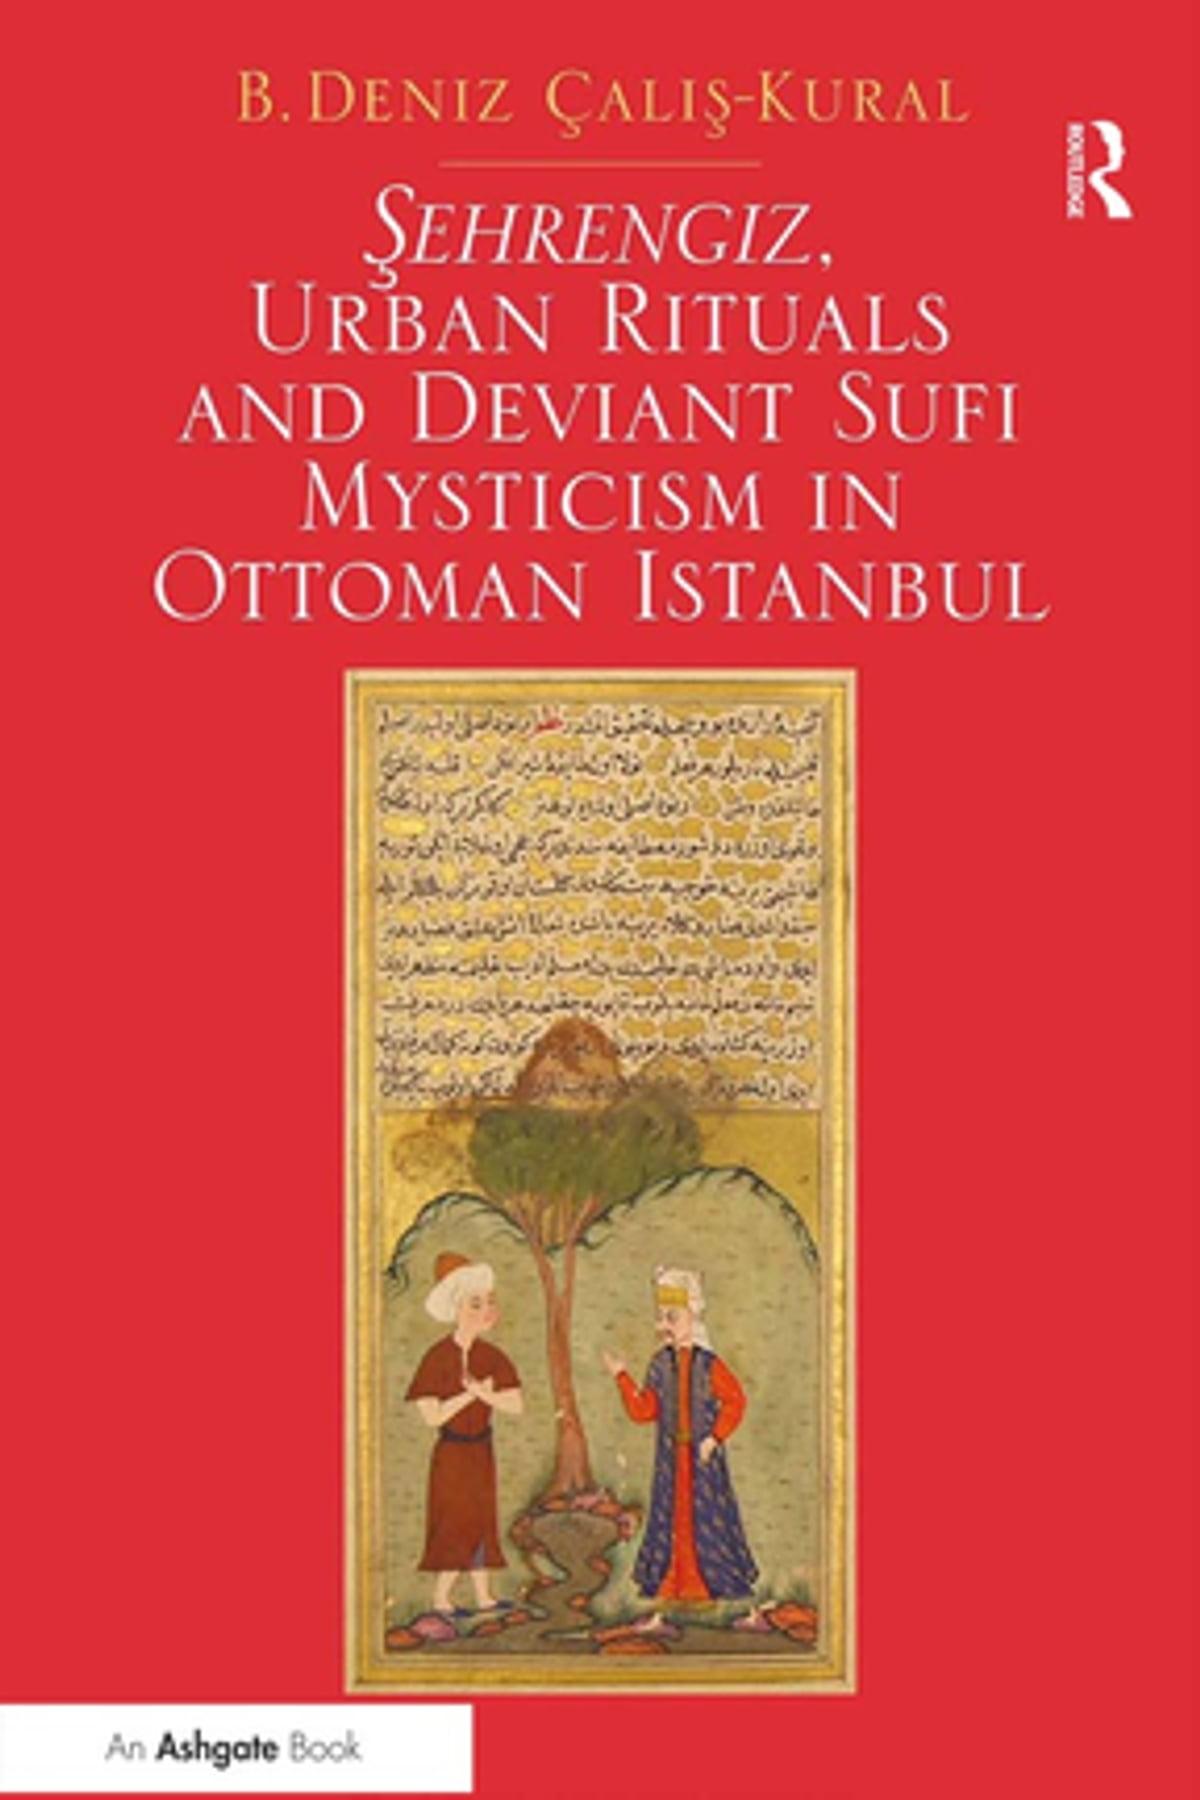 Sehrengiz, Urban Rituals and Deviant Sufi Mysticism in Ottoman Istanbul eBook by B. Deniz Calis-Kural - 9781317057727 | Rakuten Kobo